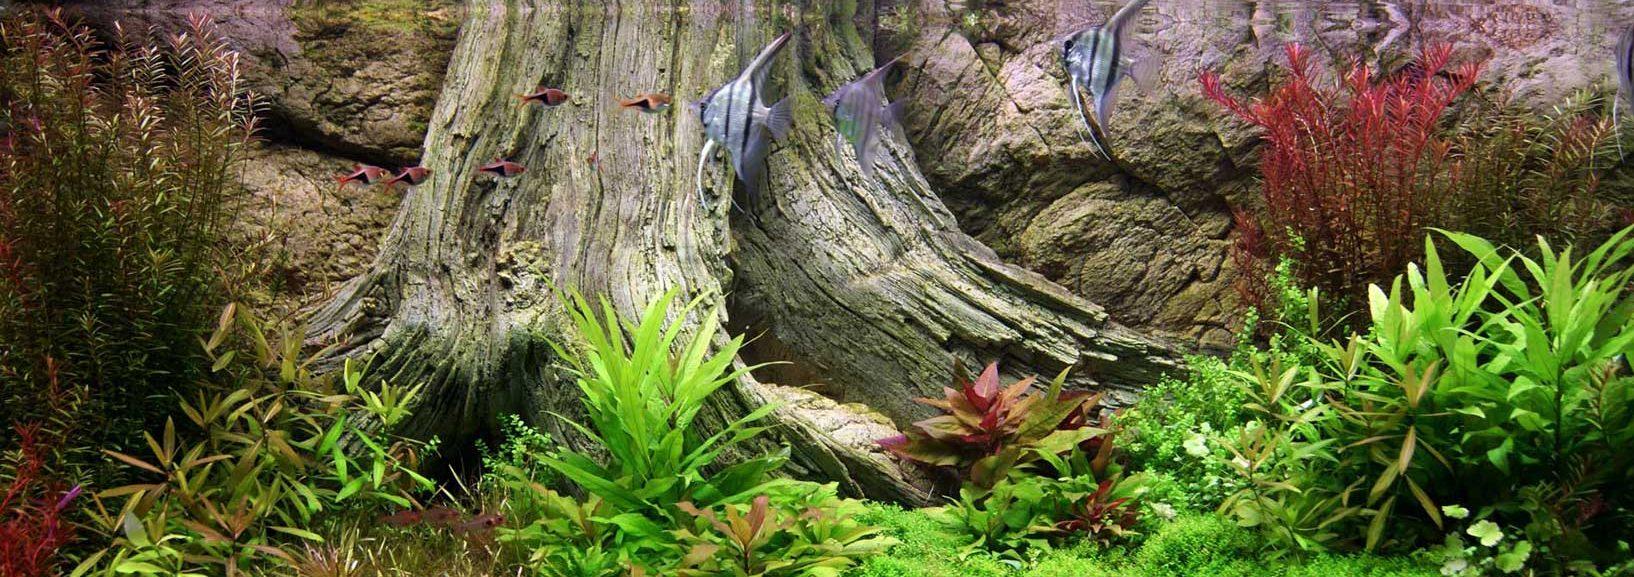 Amazonas aquarium achterwand van maanvissen